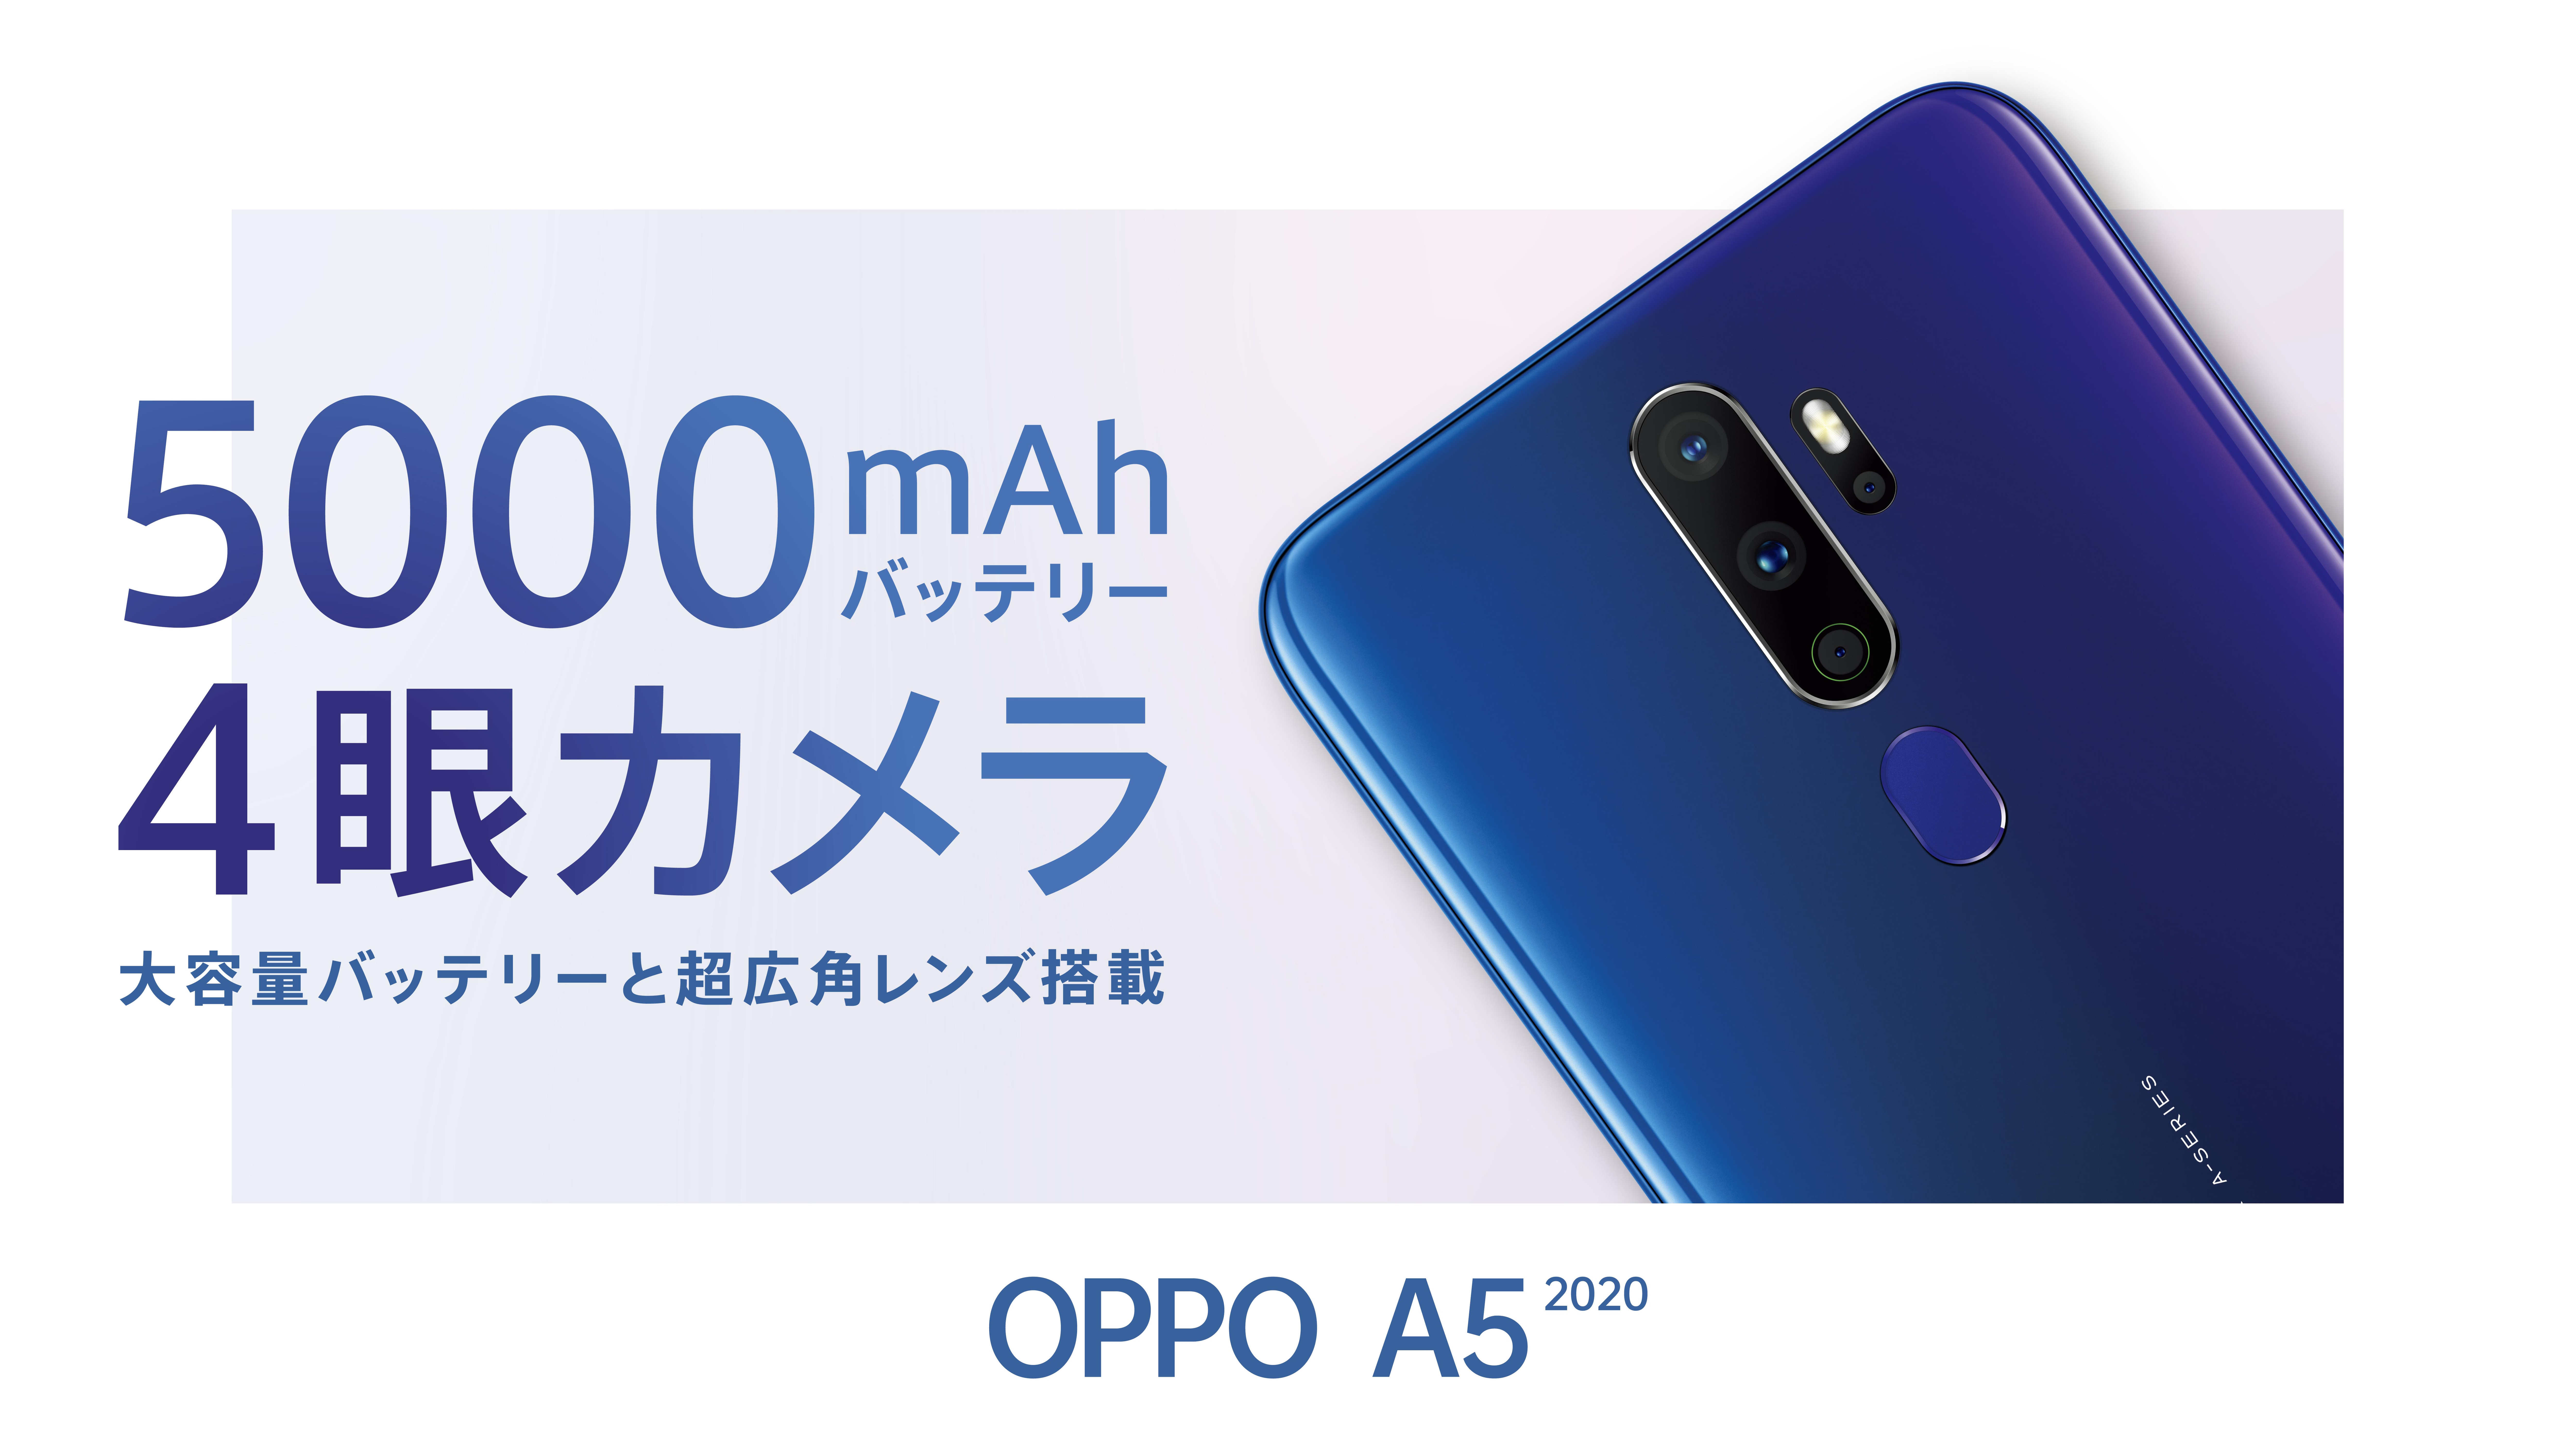 OPPO A5 2020 - 5000mAh Battery 48MP Ultra Wide Quad Camera